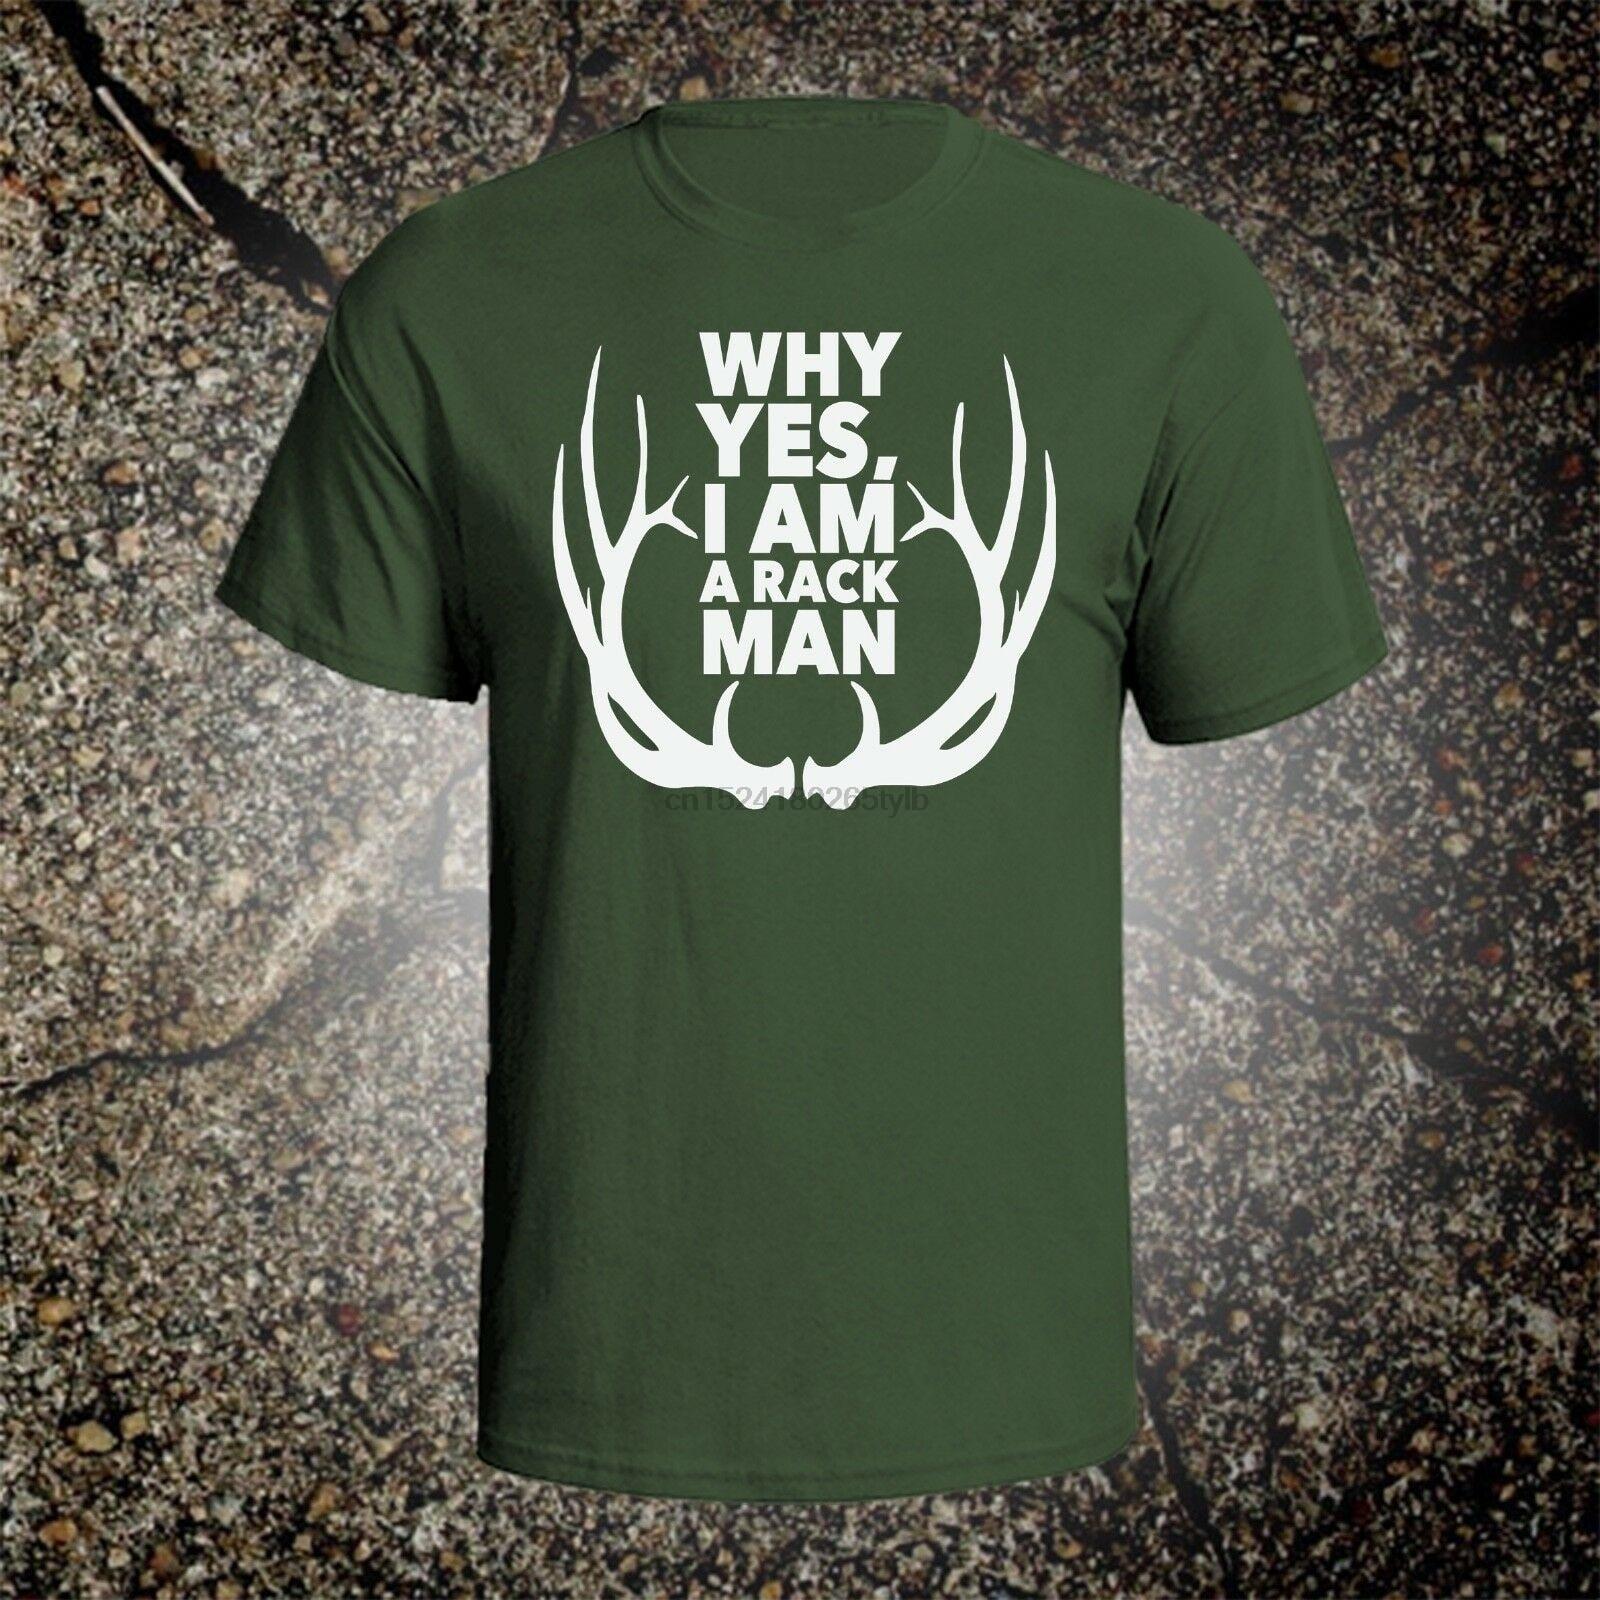 Sí, soy un Rack, hombre, Estilo vintage, camiseta gráfica, mossberg, caza